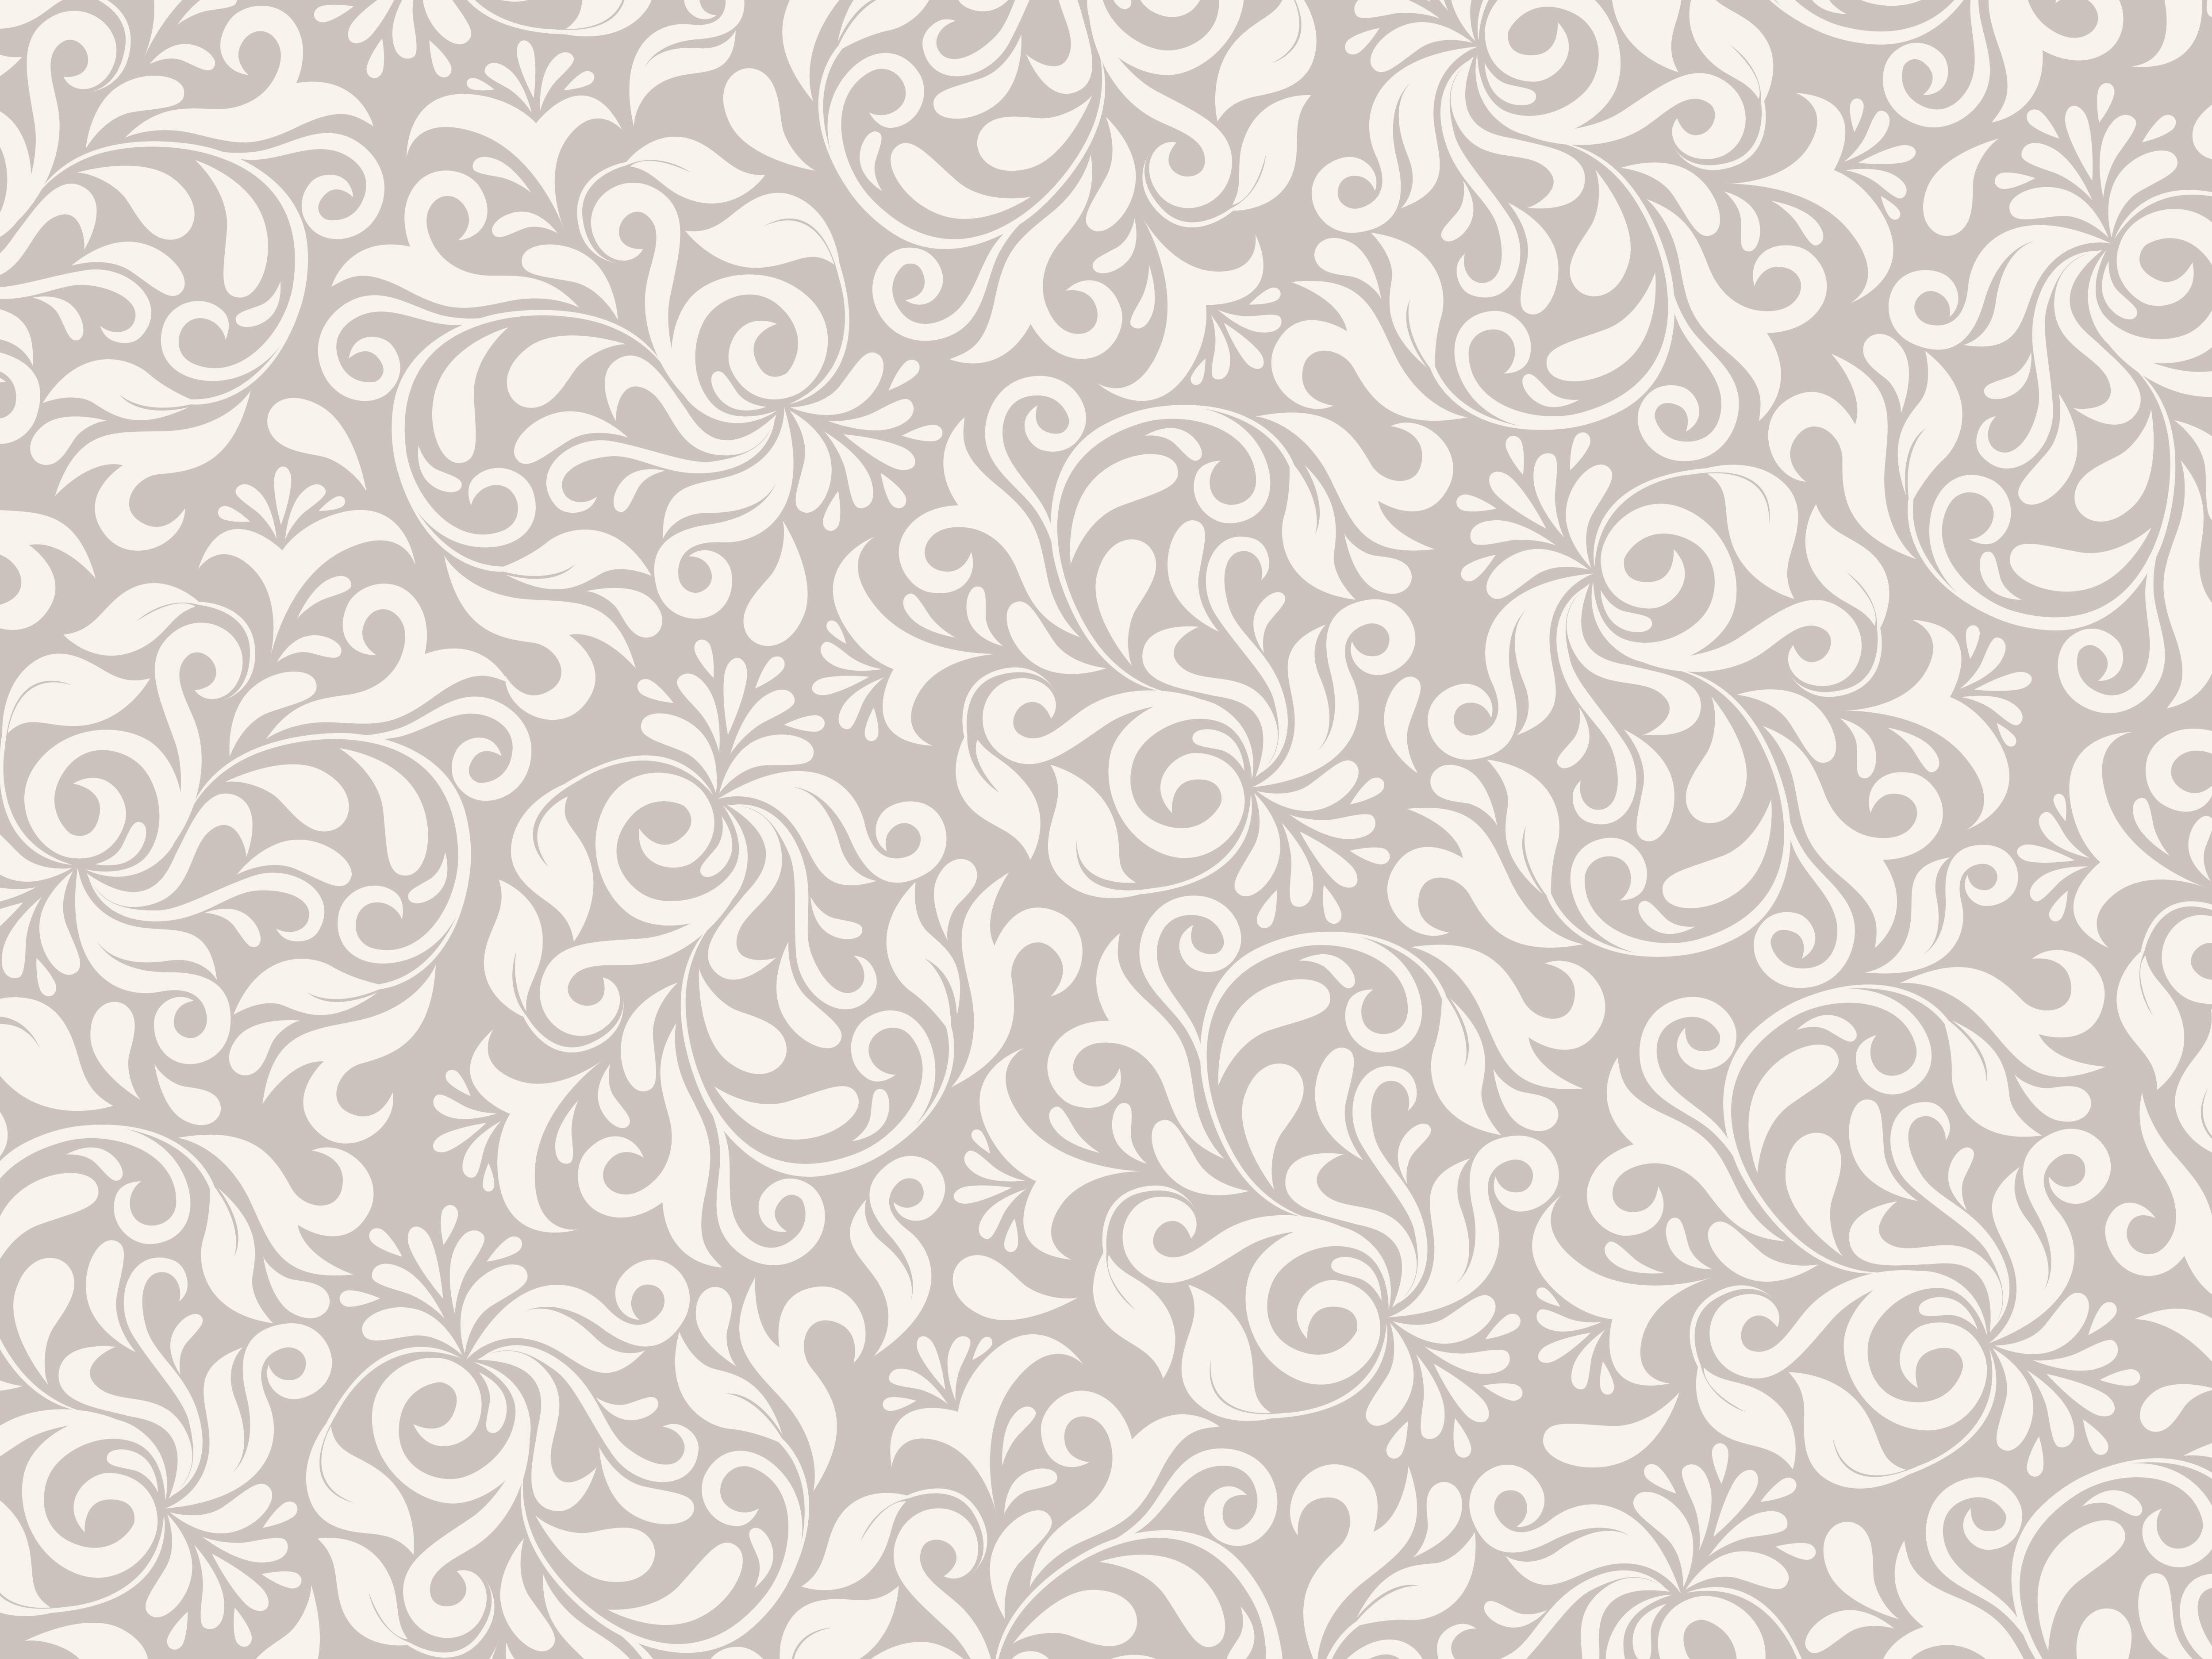 Floral Pattern Background Wallpaper 16341 - Baltana